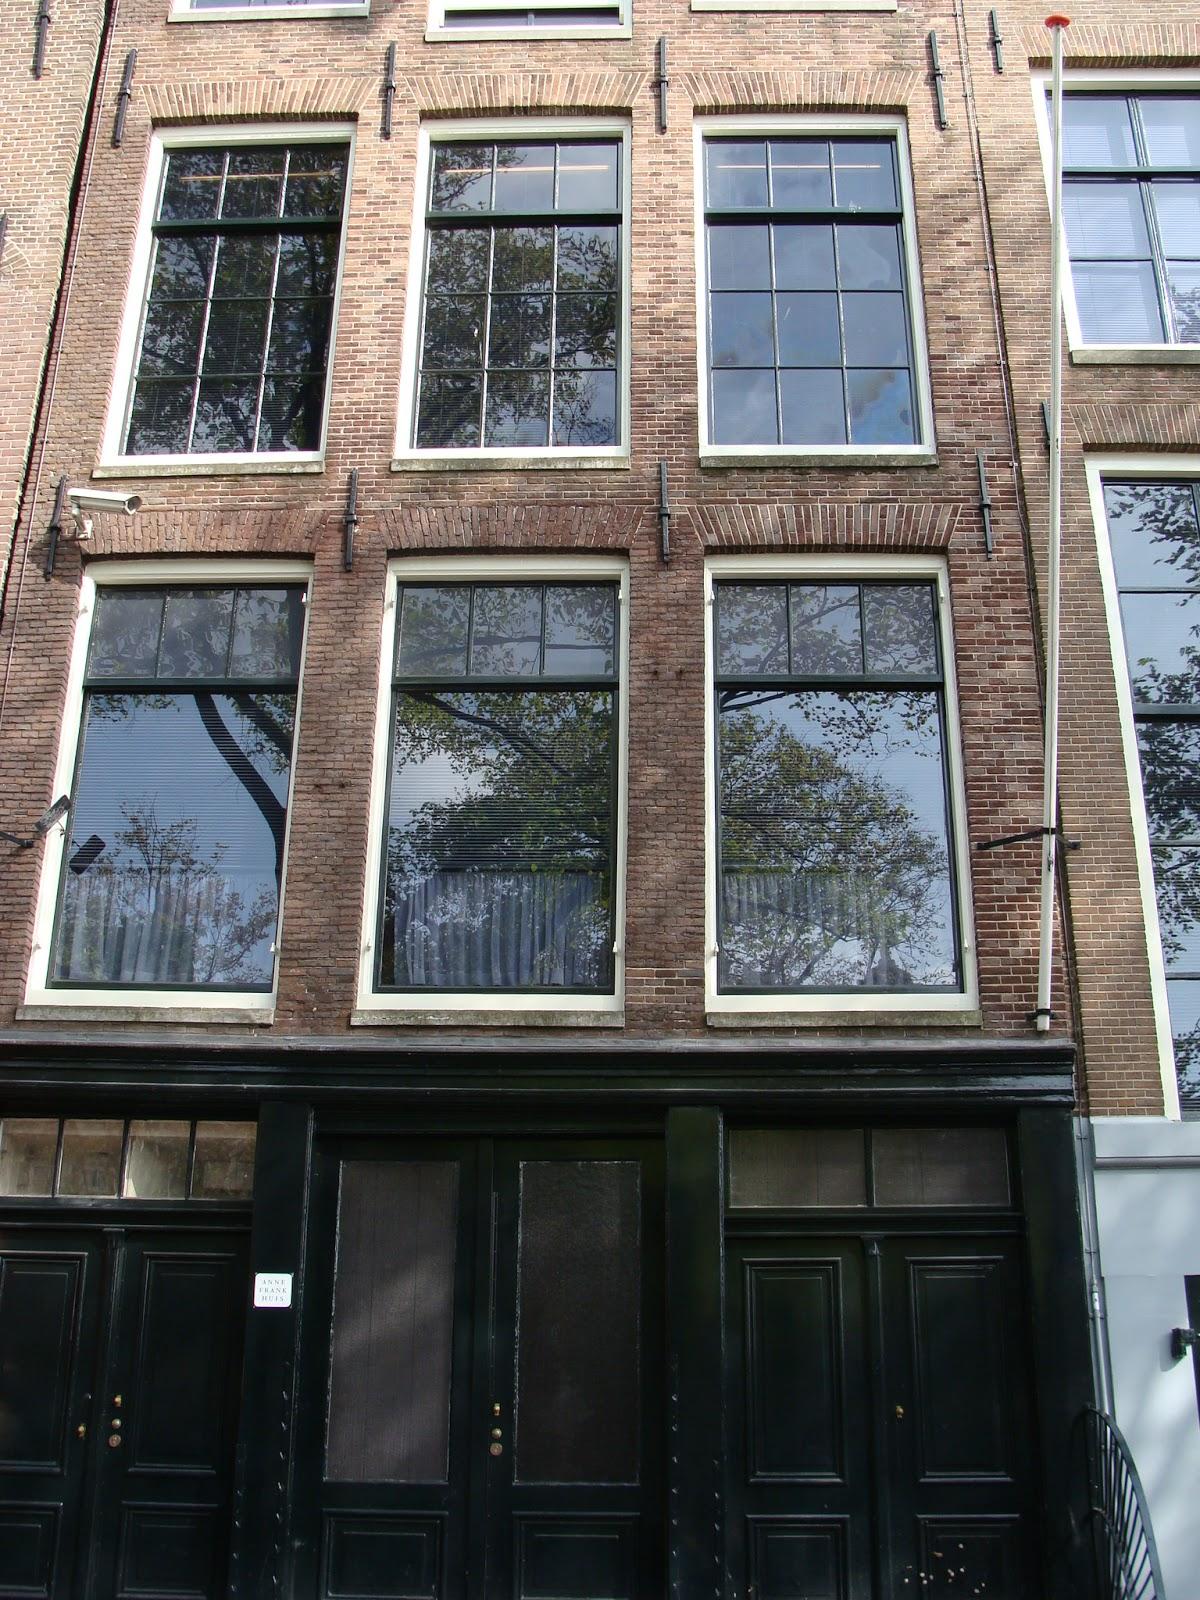 Patrícia de Paula - Street Photography: Anne Frank House ...